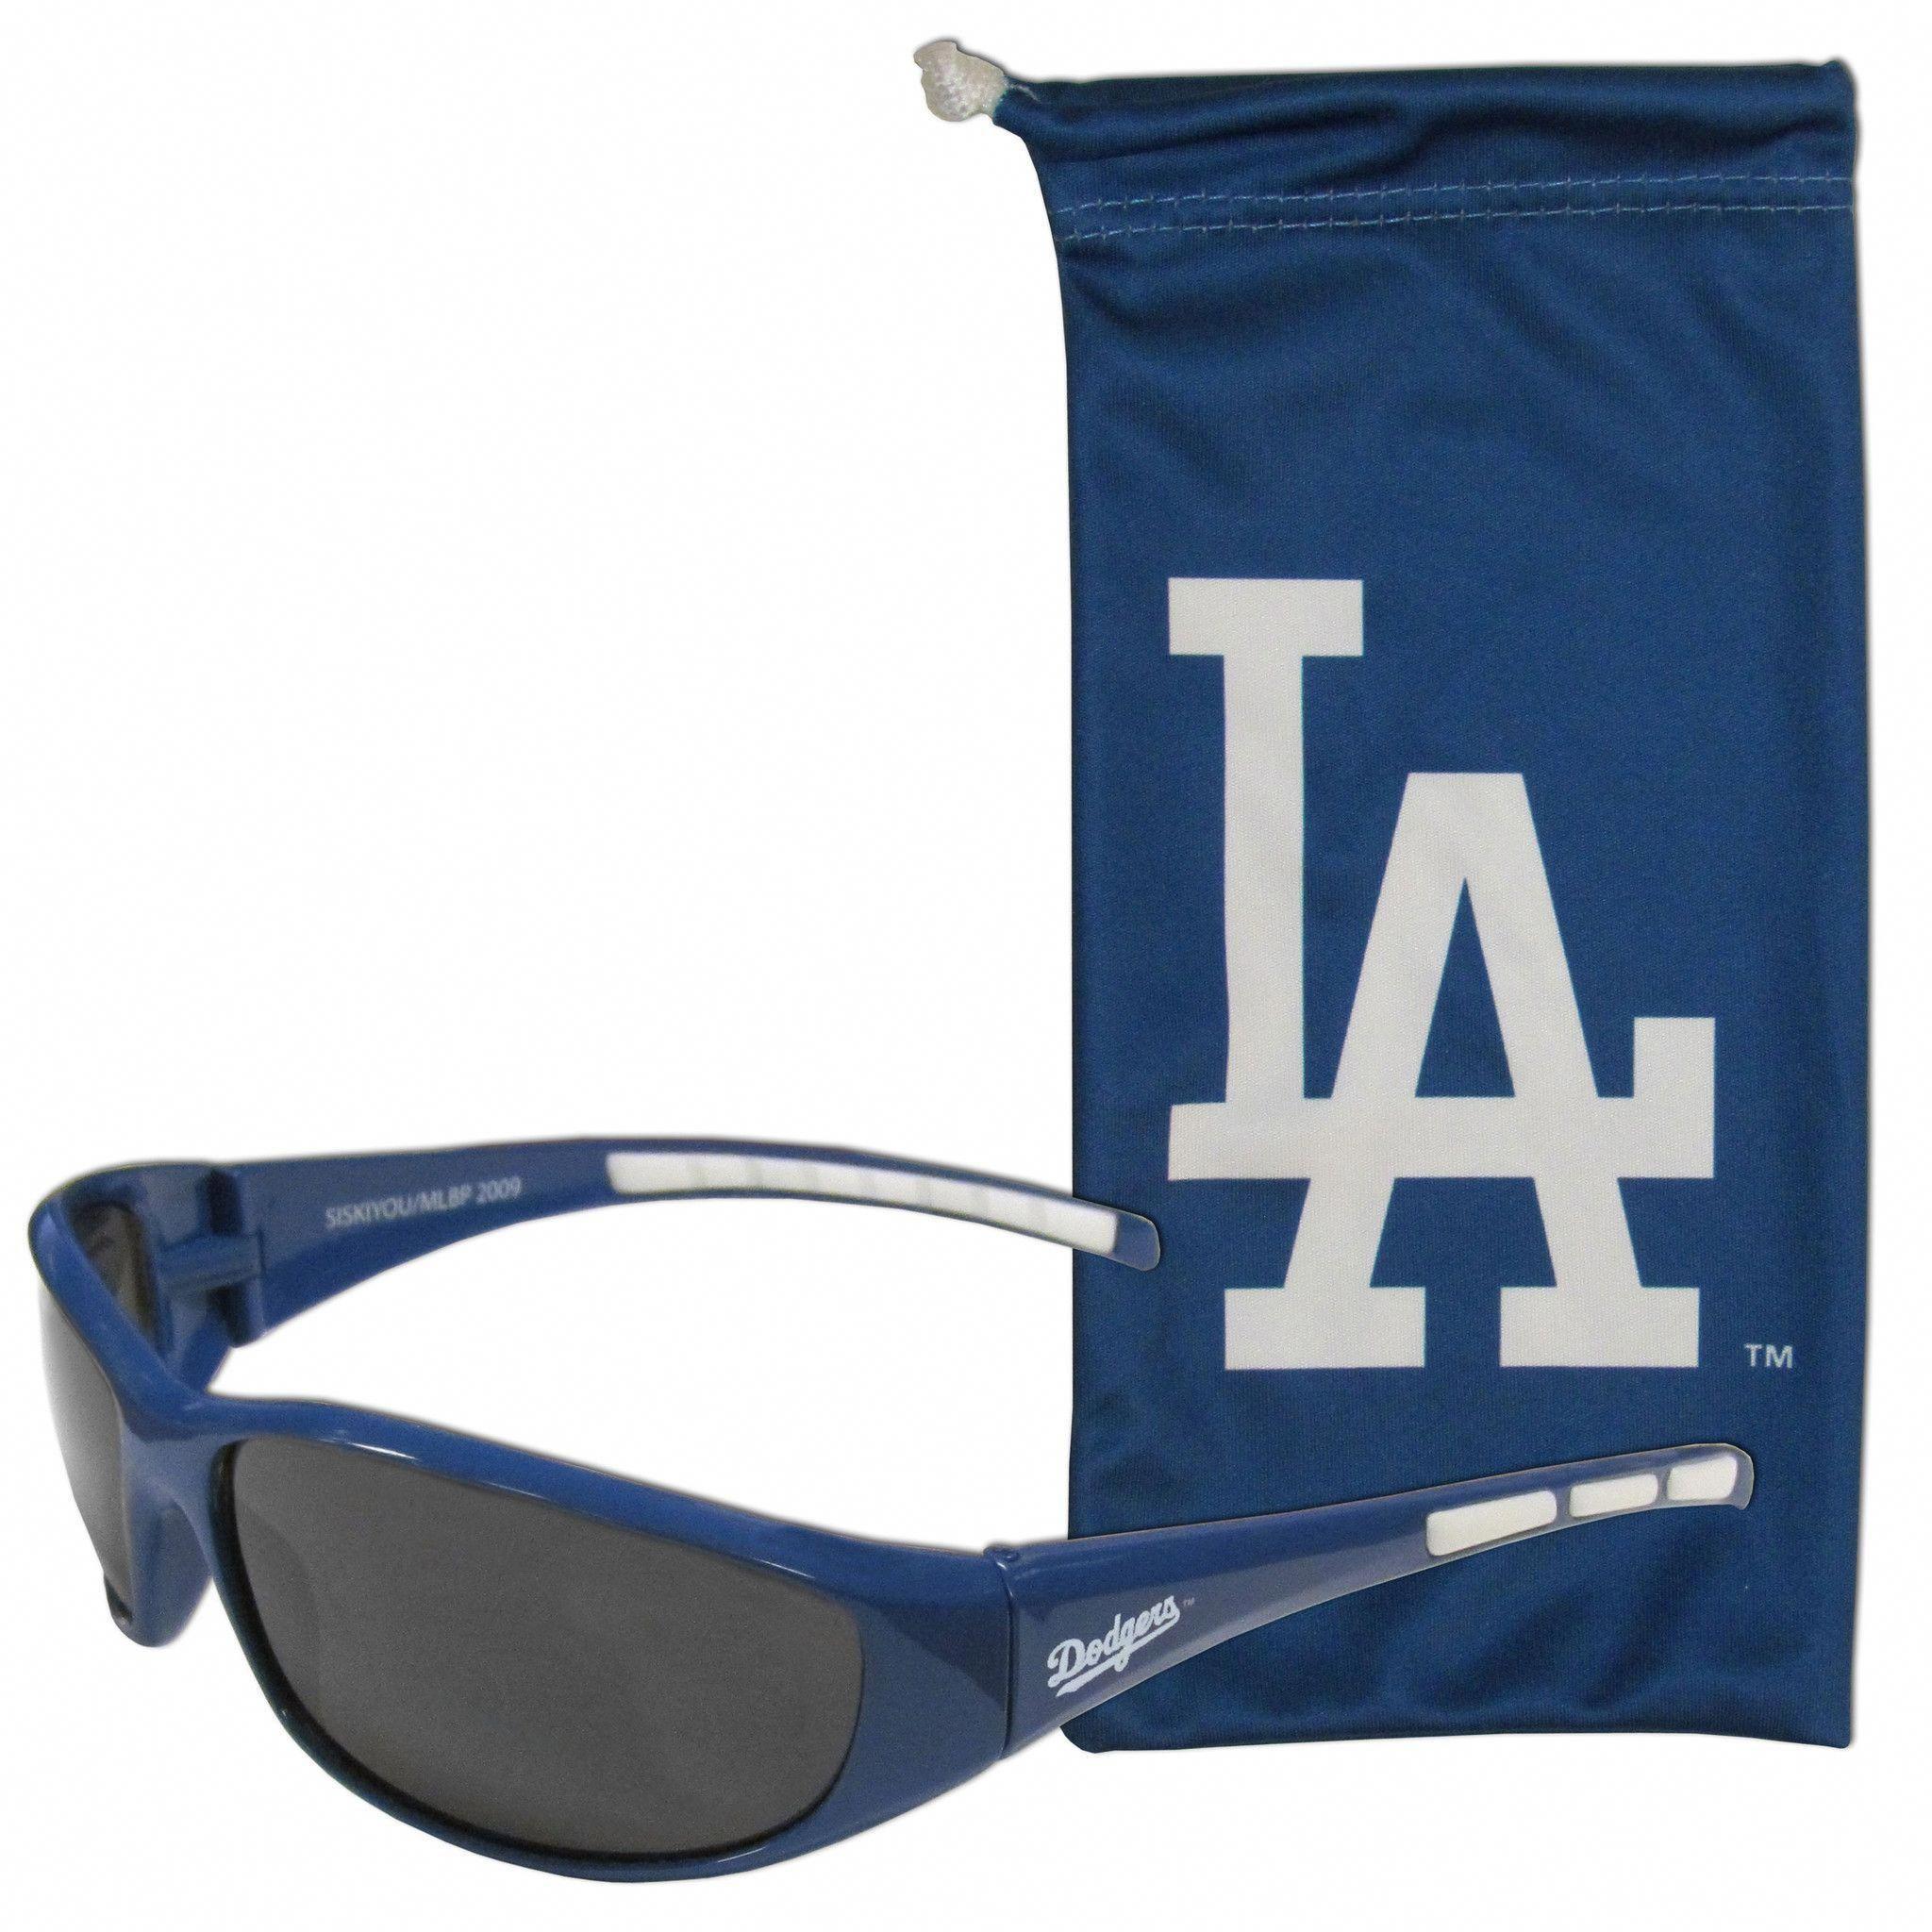 2865b2d2235 Los Angeles Dodgers Sunglass and Bag Set  baseballsunglasses ...